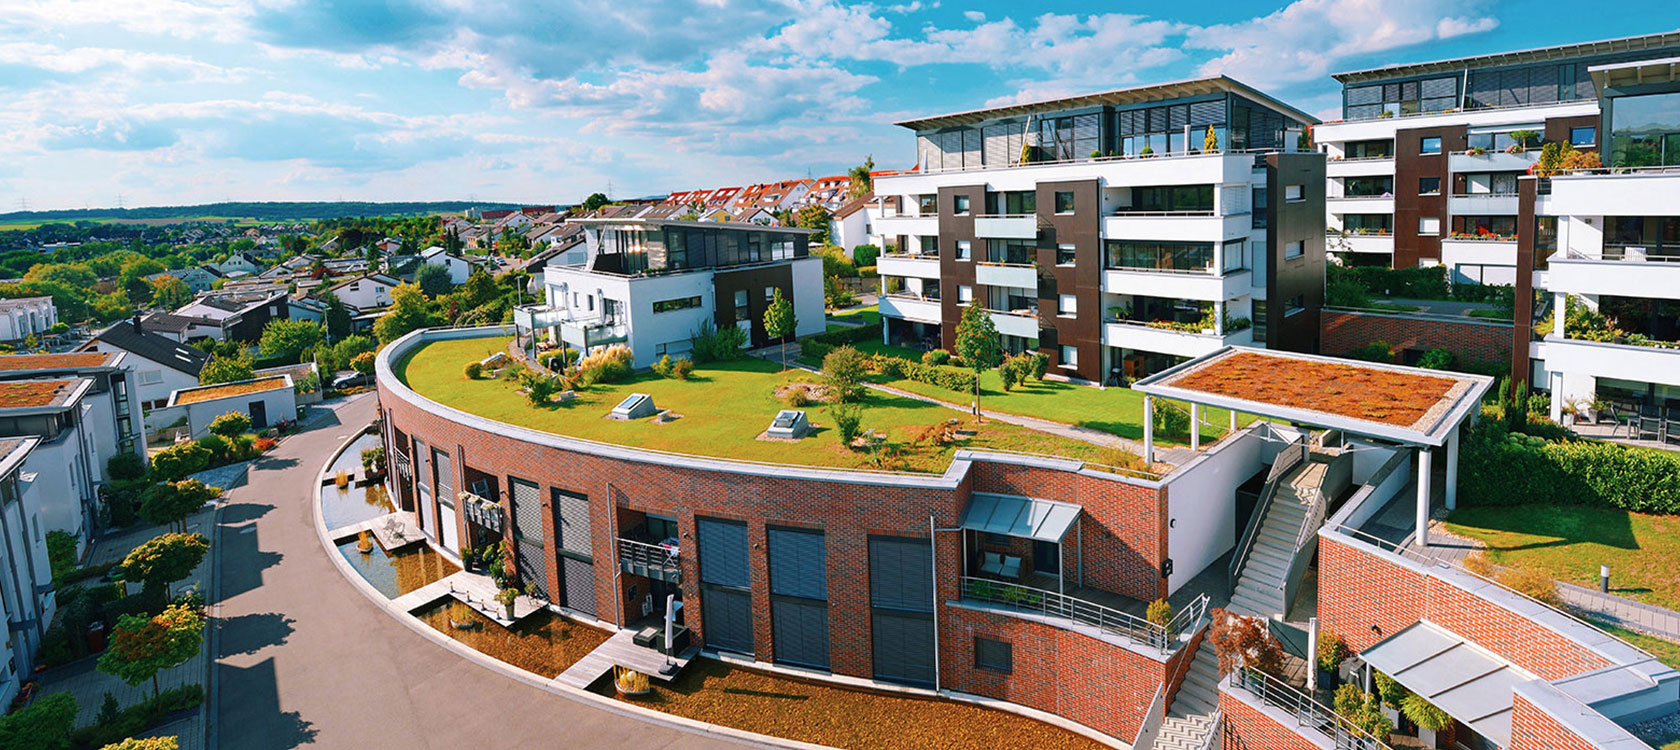 Schöner Wo immobilien kaufen neubau ludwigsburg neubauprojekte ludwigsburg